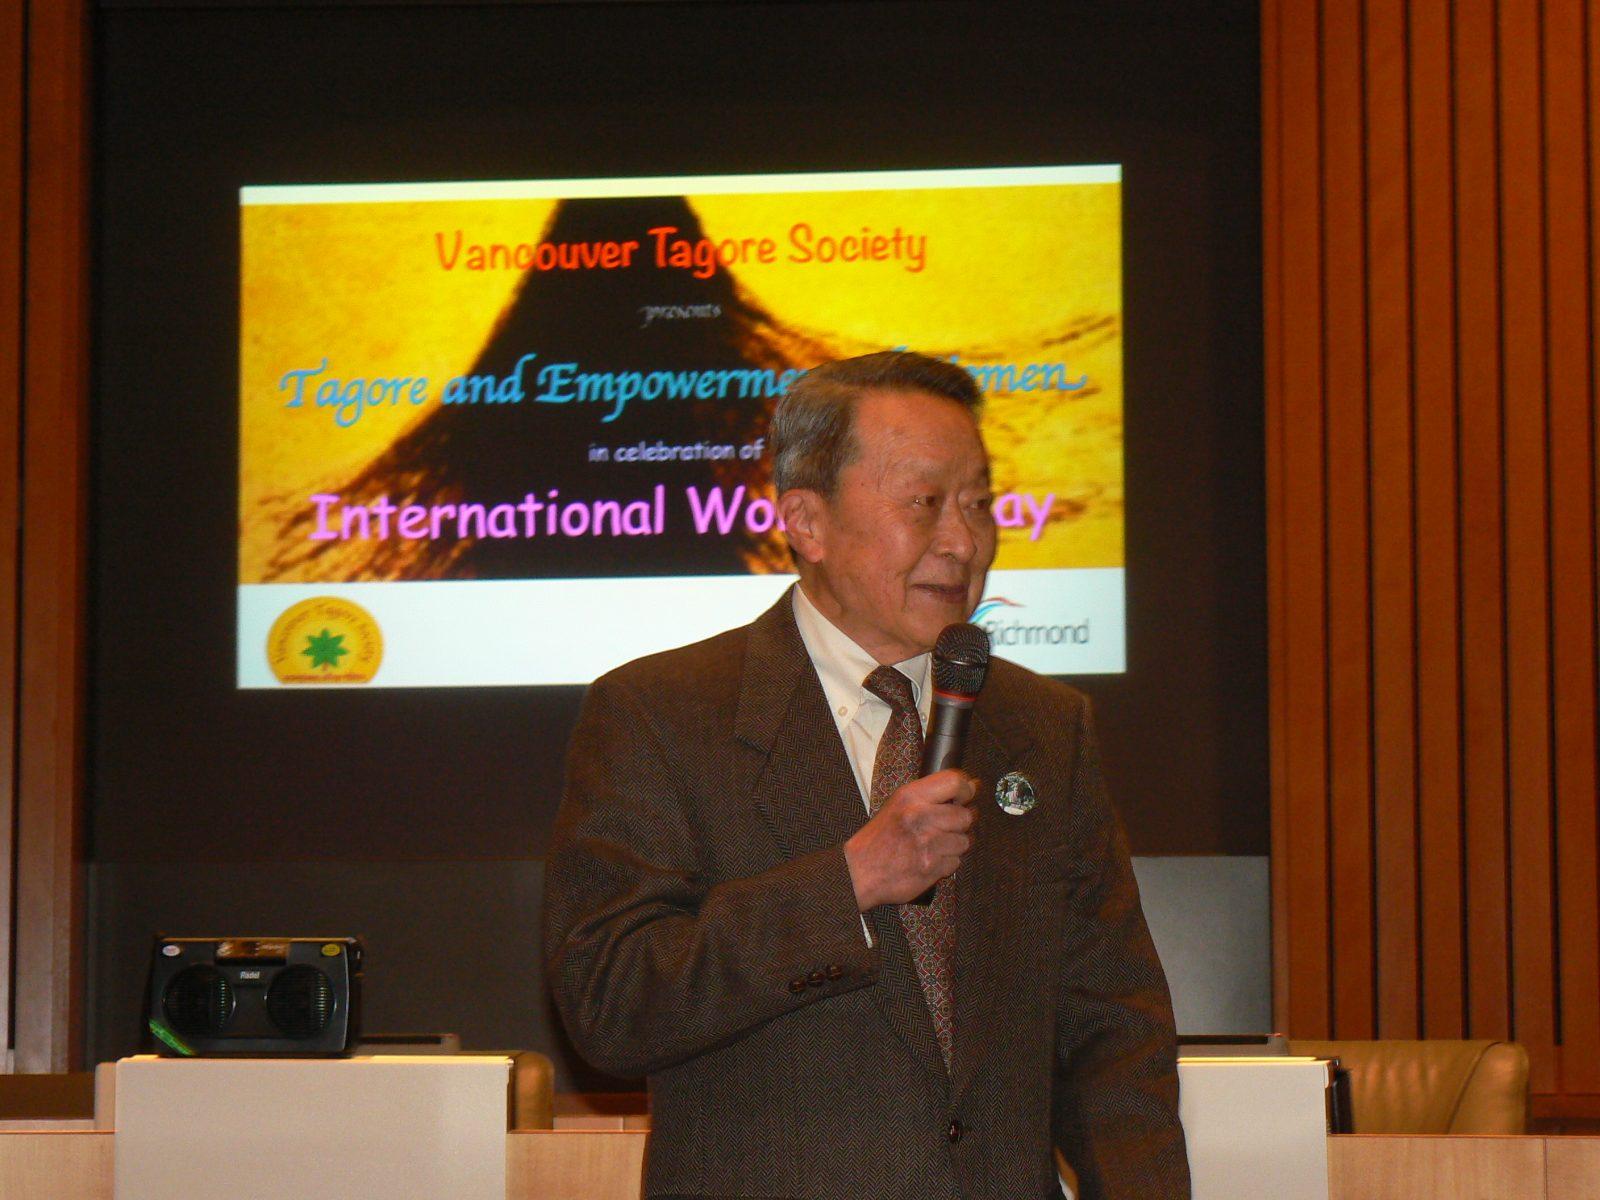 Lee Tan President Vancouver Tagor Society